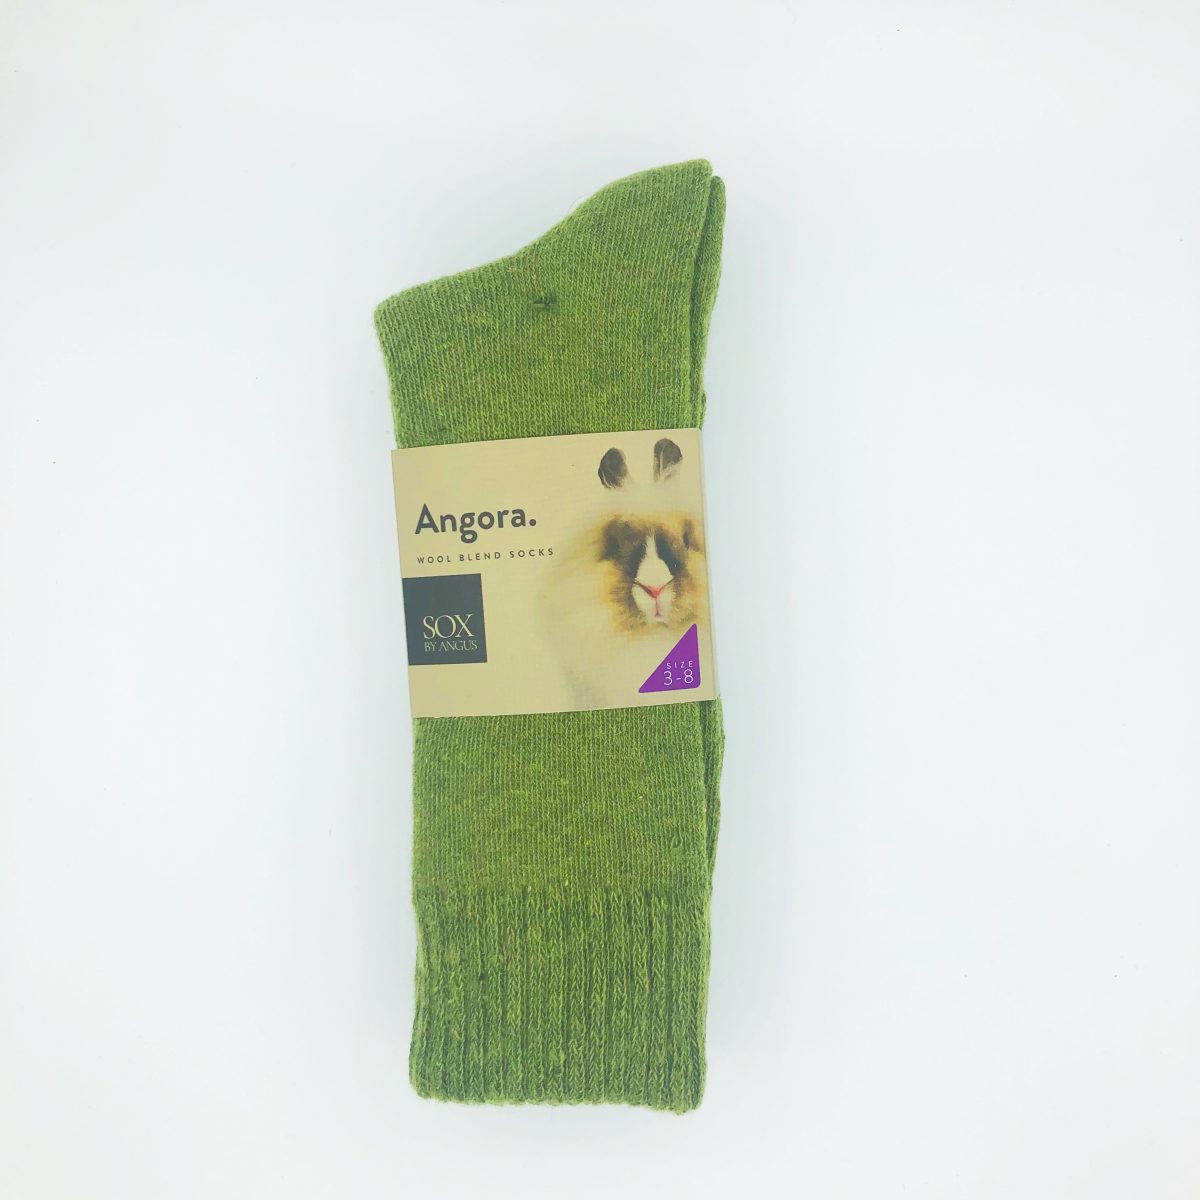 Angora Wool Blend Socks 2 Pair Pack - Khaki Green